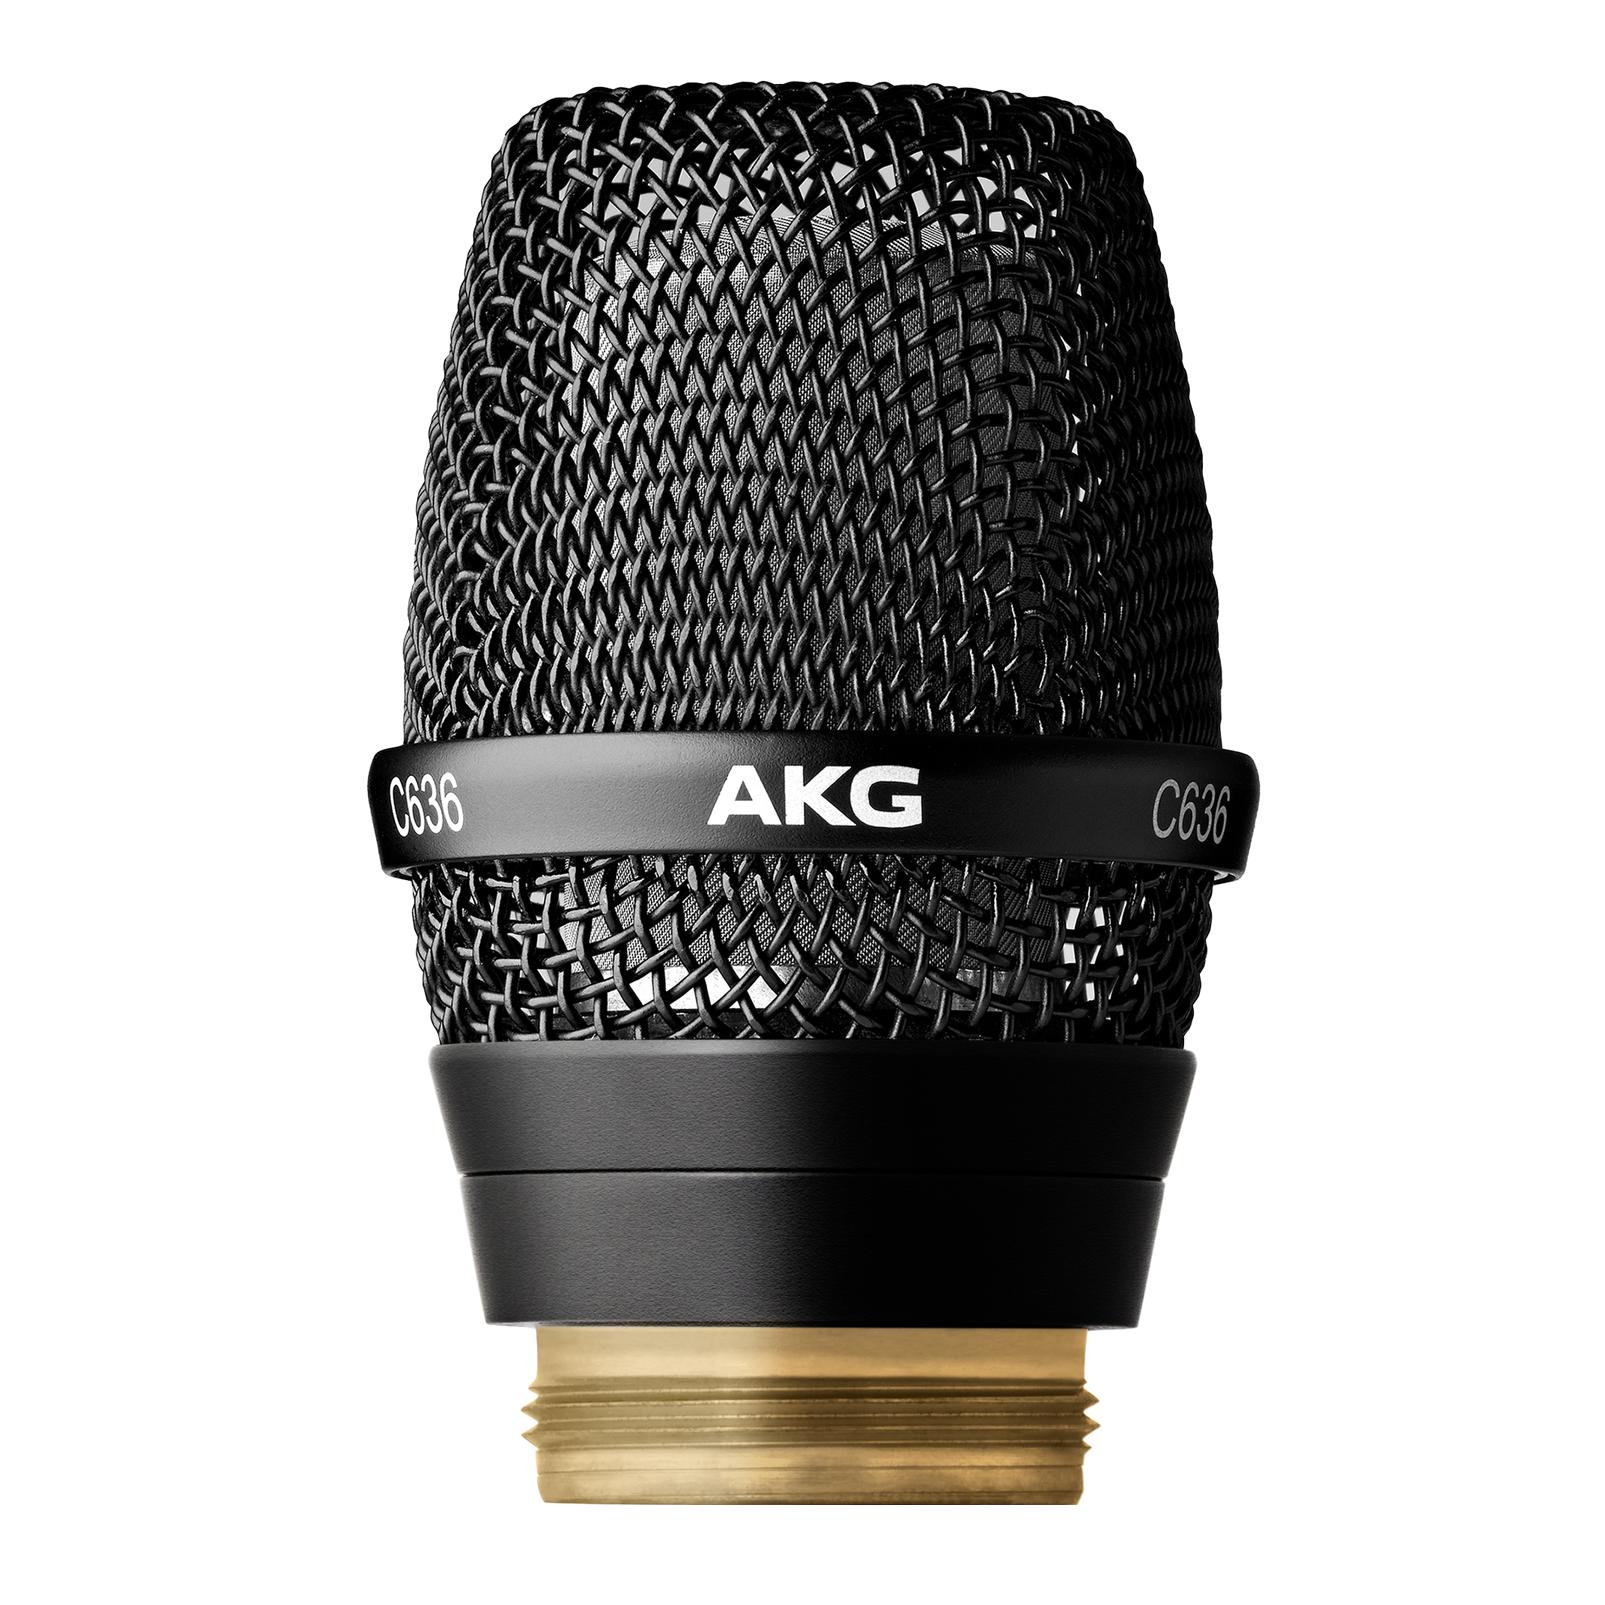 C636 WL1 - Black - Master reference condenser vocal microphone head - Hero